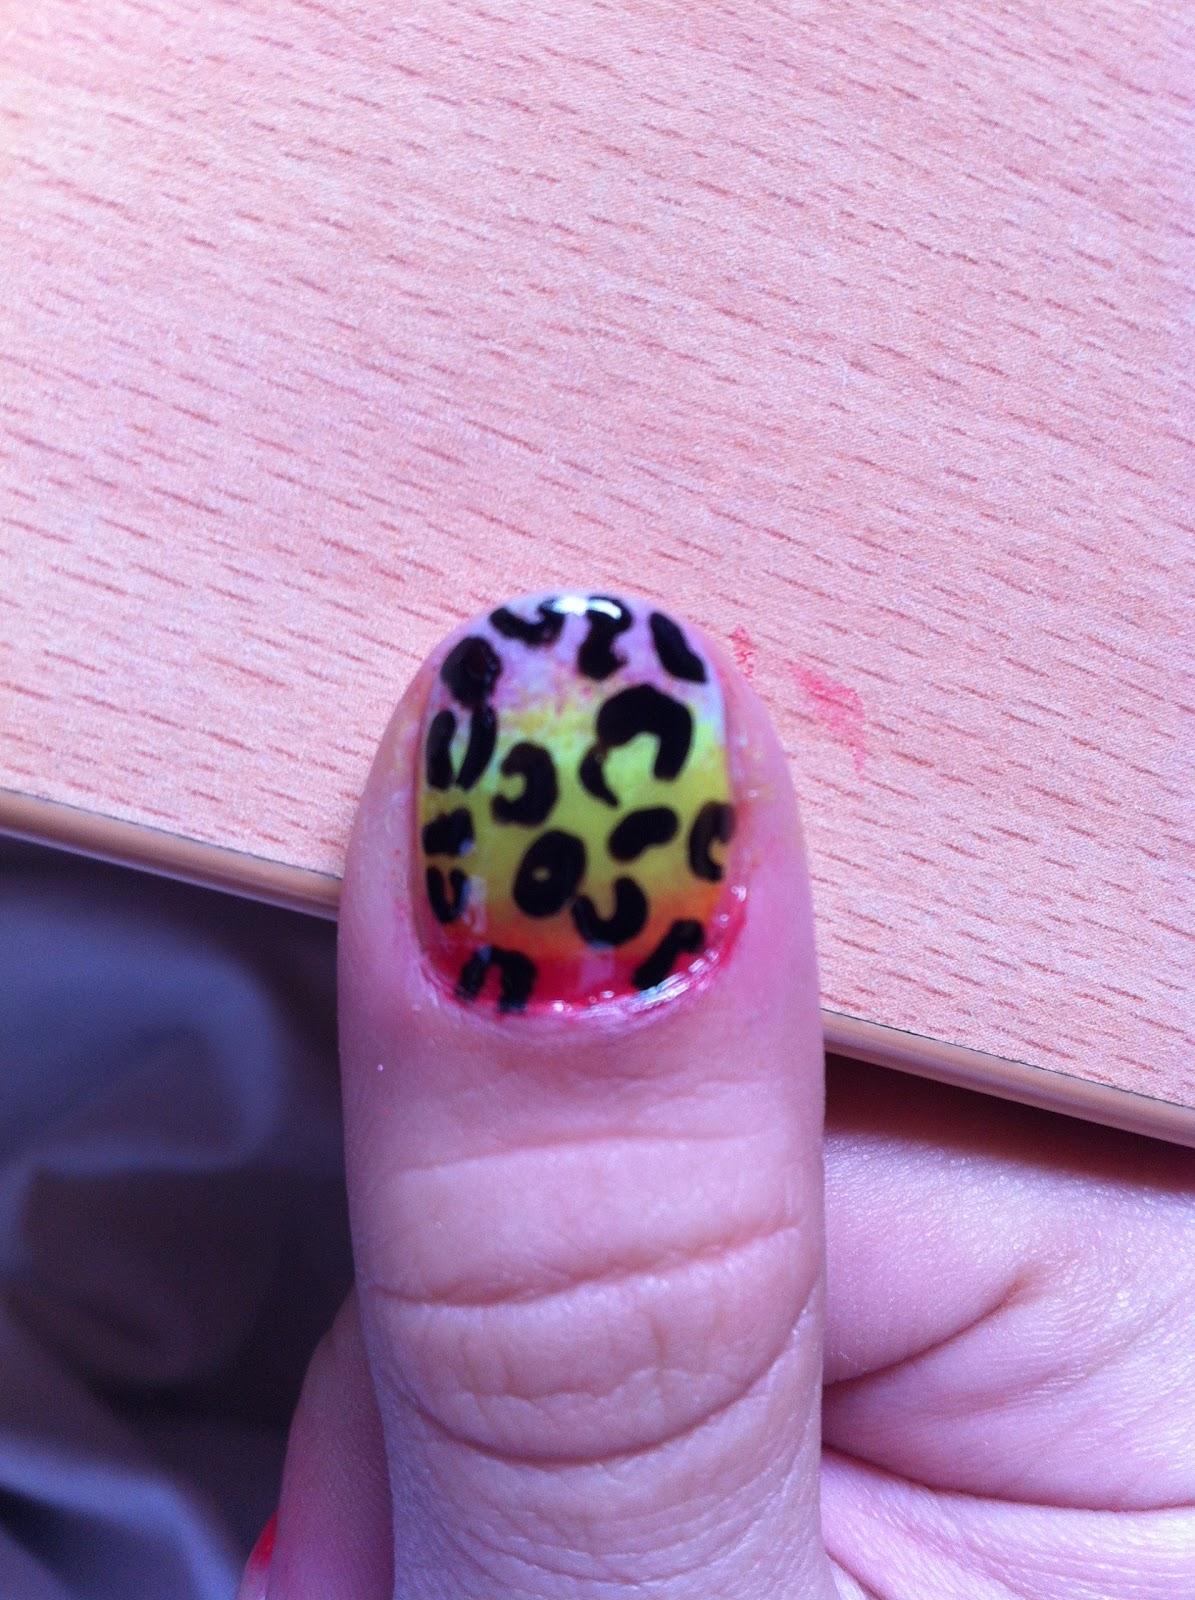 diekleenemara nails nails nails. Black Bedroom Furniture Sets. Home Design Ideas